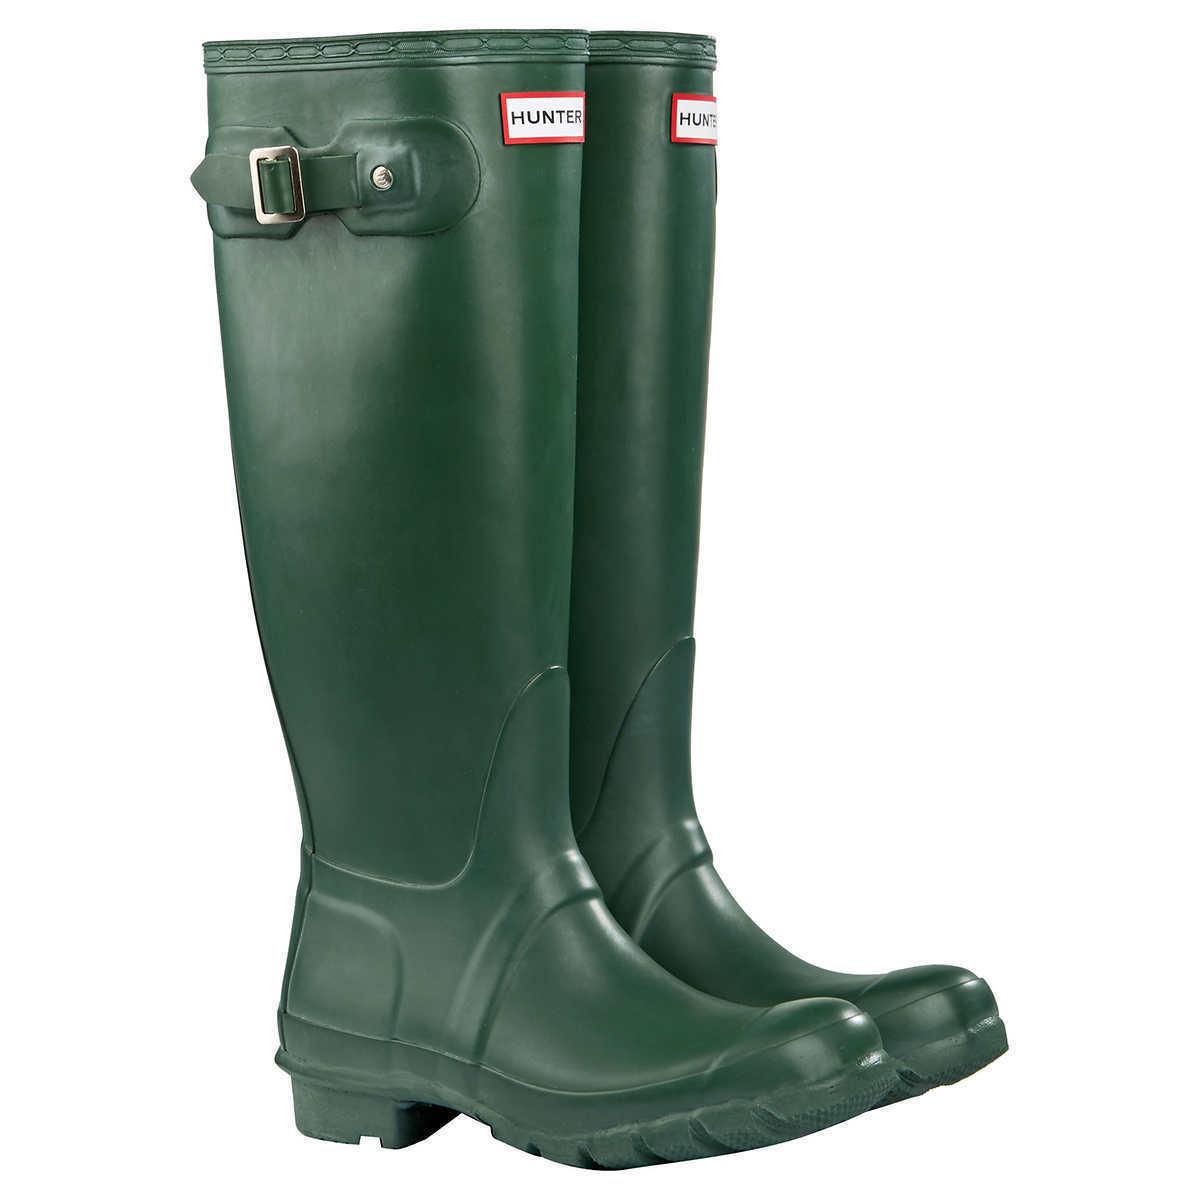 designer online Hunter Donna    Original Tall Matte Rain stivali verde Pick A Dimensione MSRP  150  forma unica